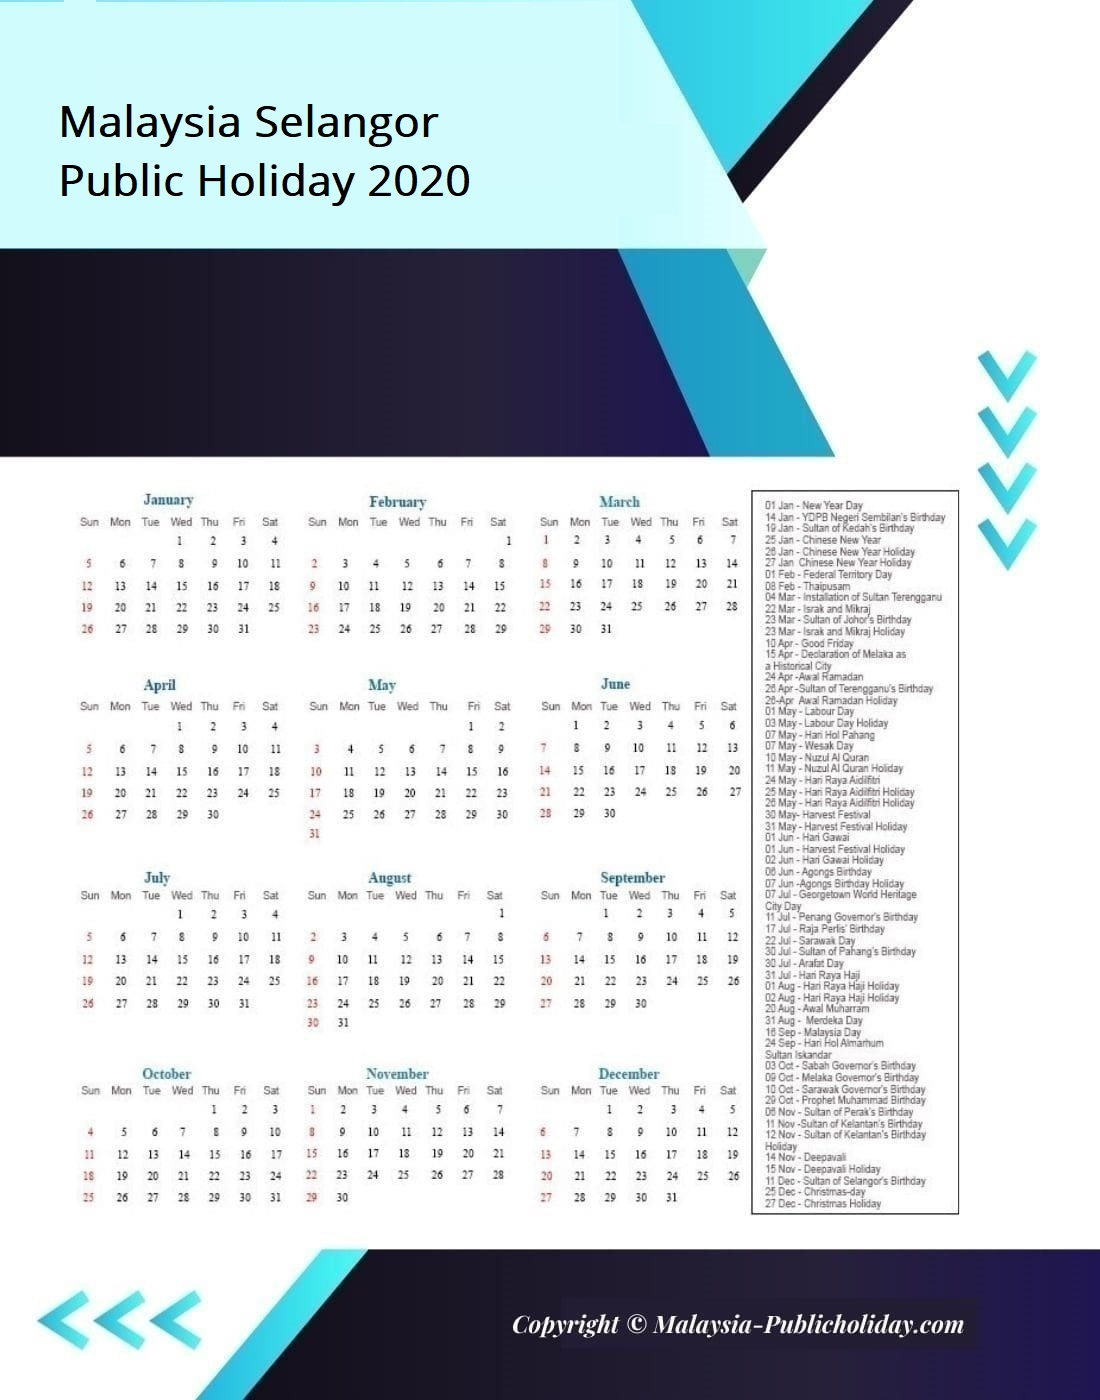 Selangor Calendars with Holidays 2020